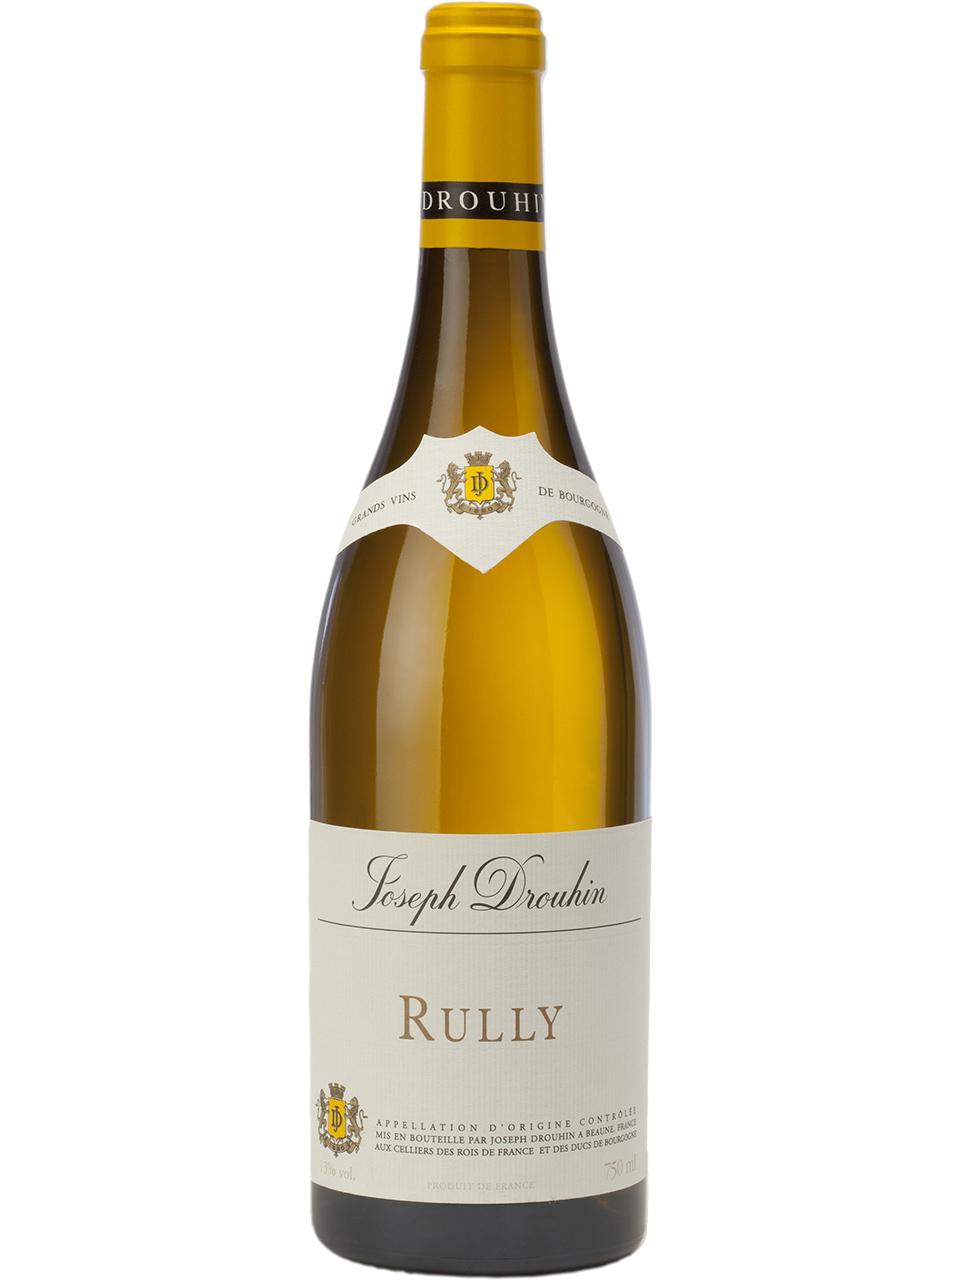 Drouhin Rully Blanc